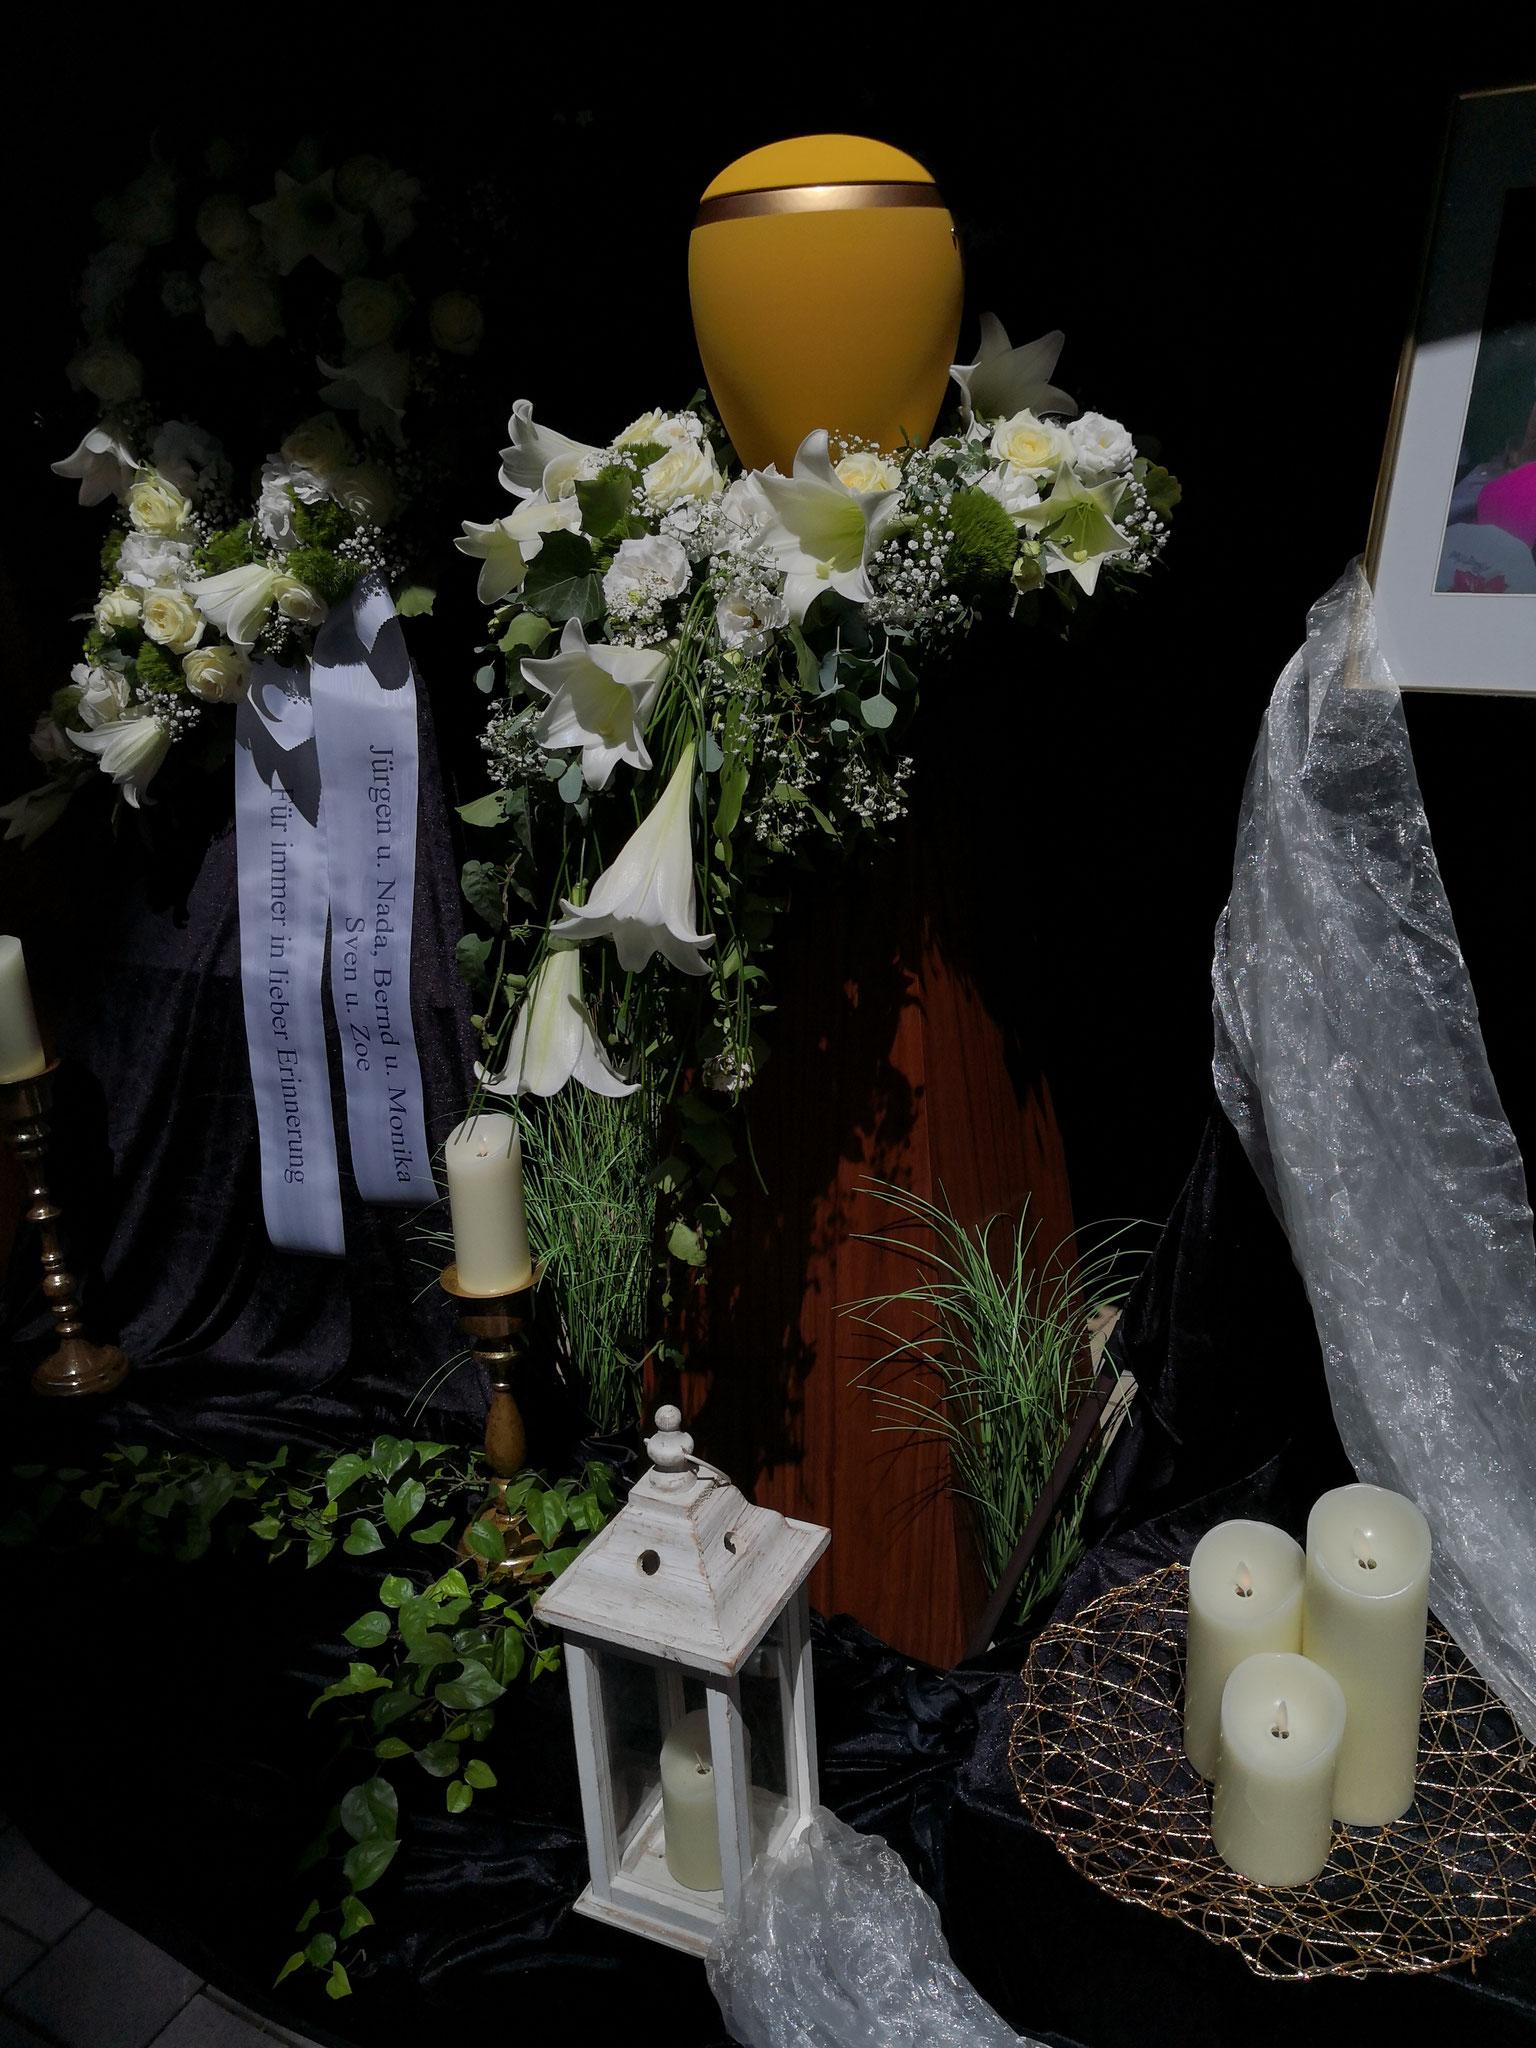 Ortsfriedhof Oberstenfed